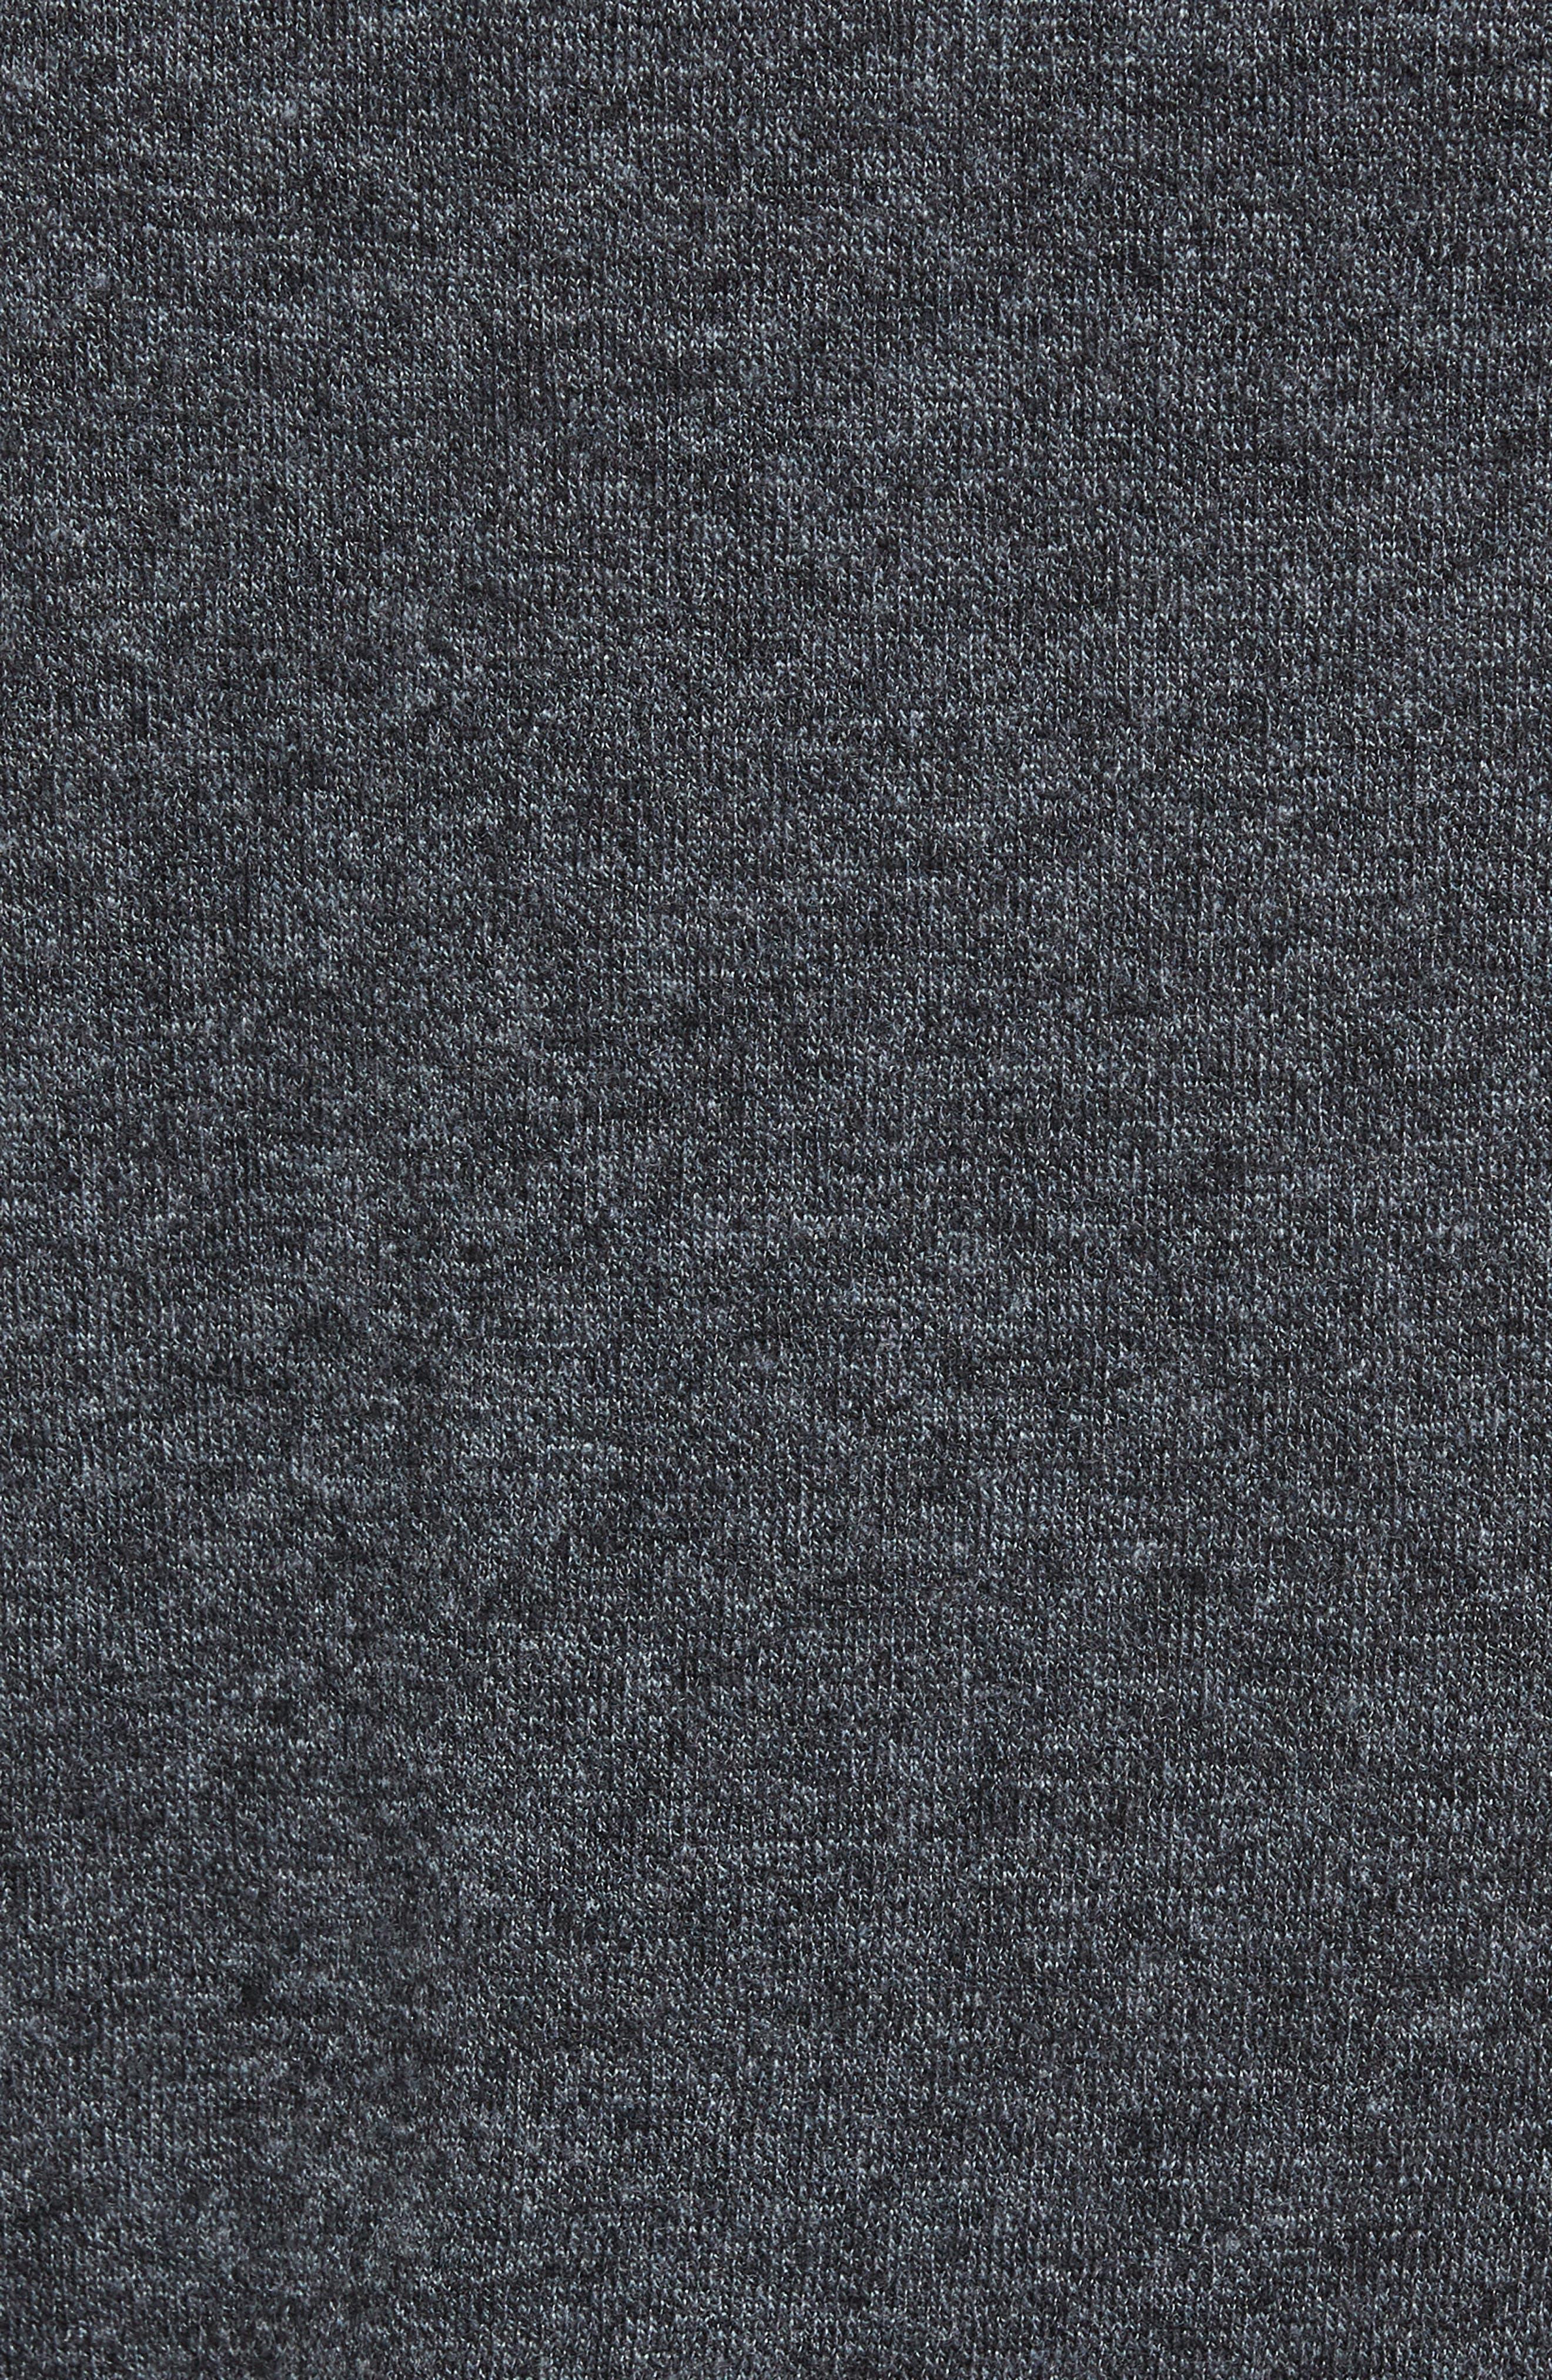 Norpol Crewneck Sweater,                             Alternate thumbnail 5, color,                             010